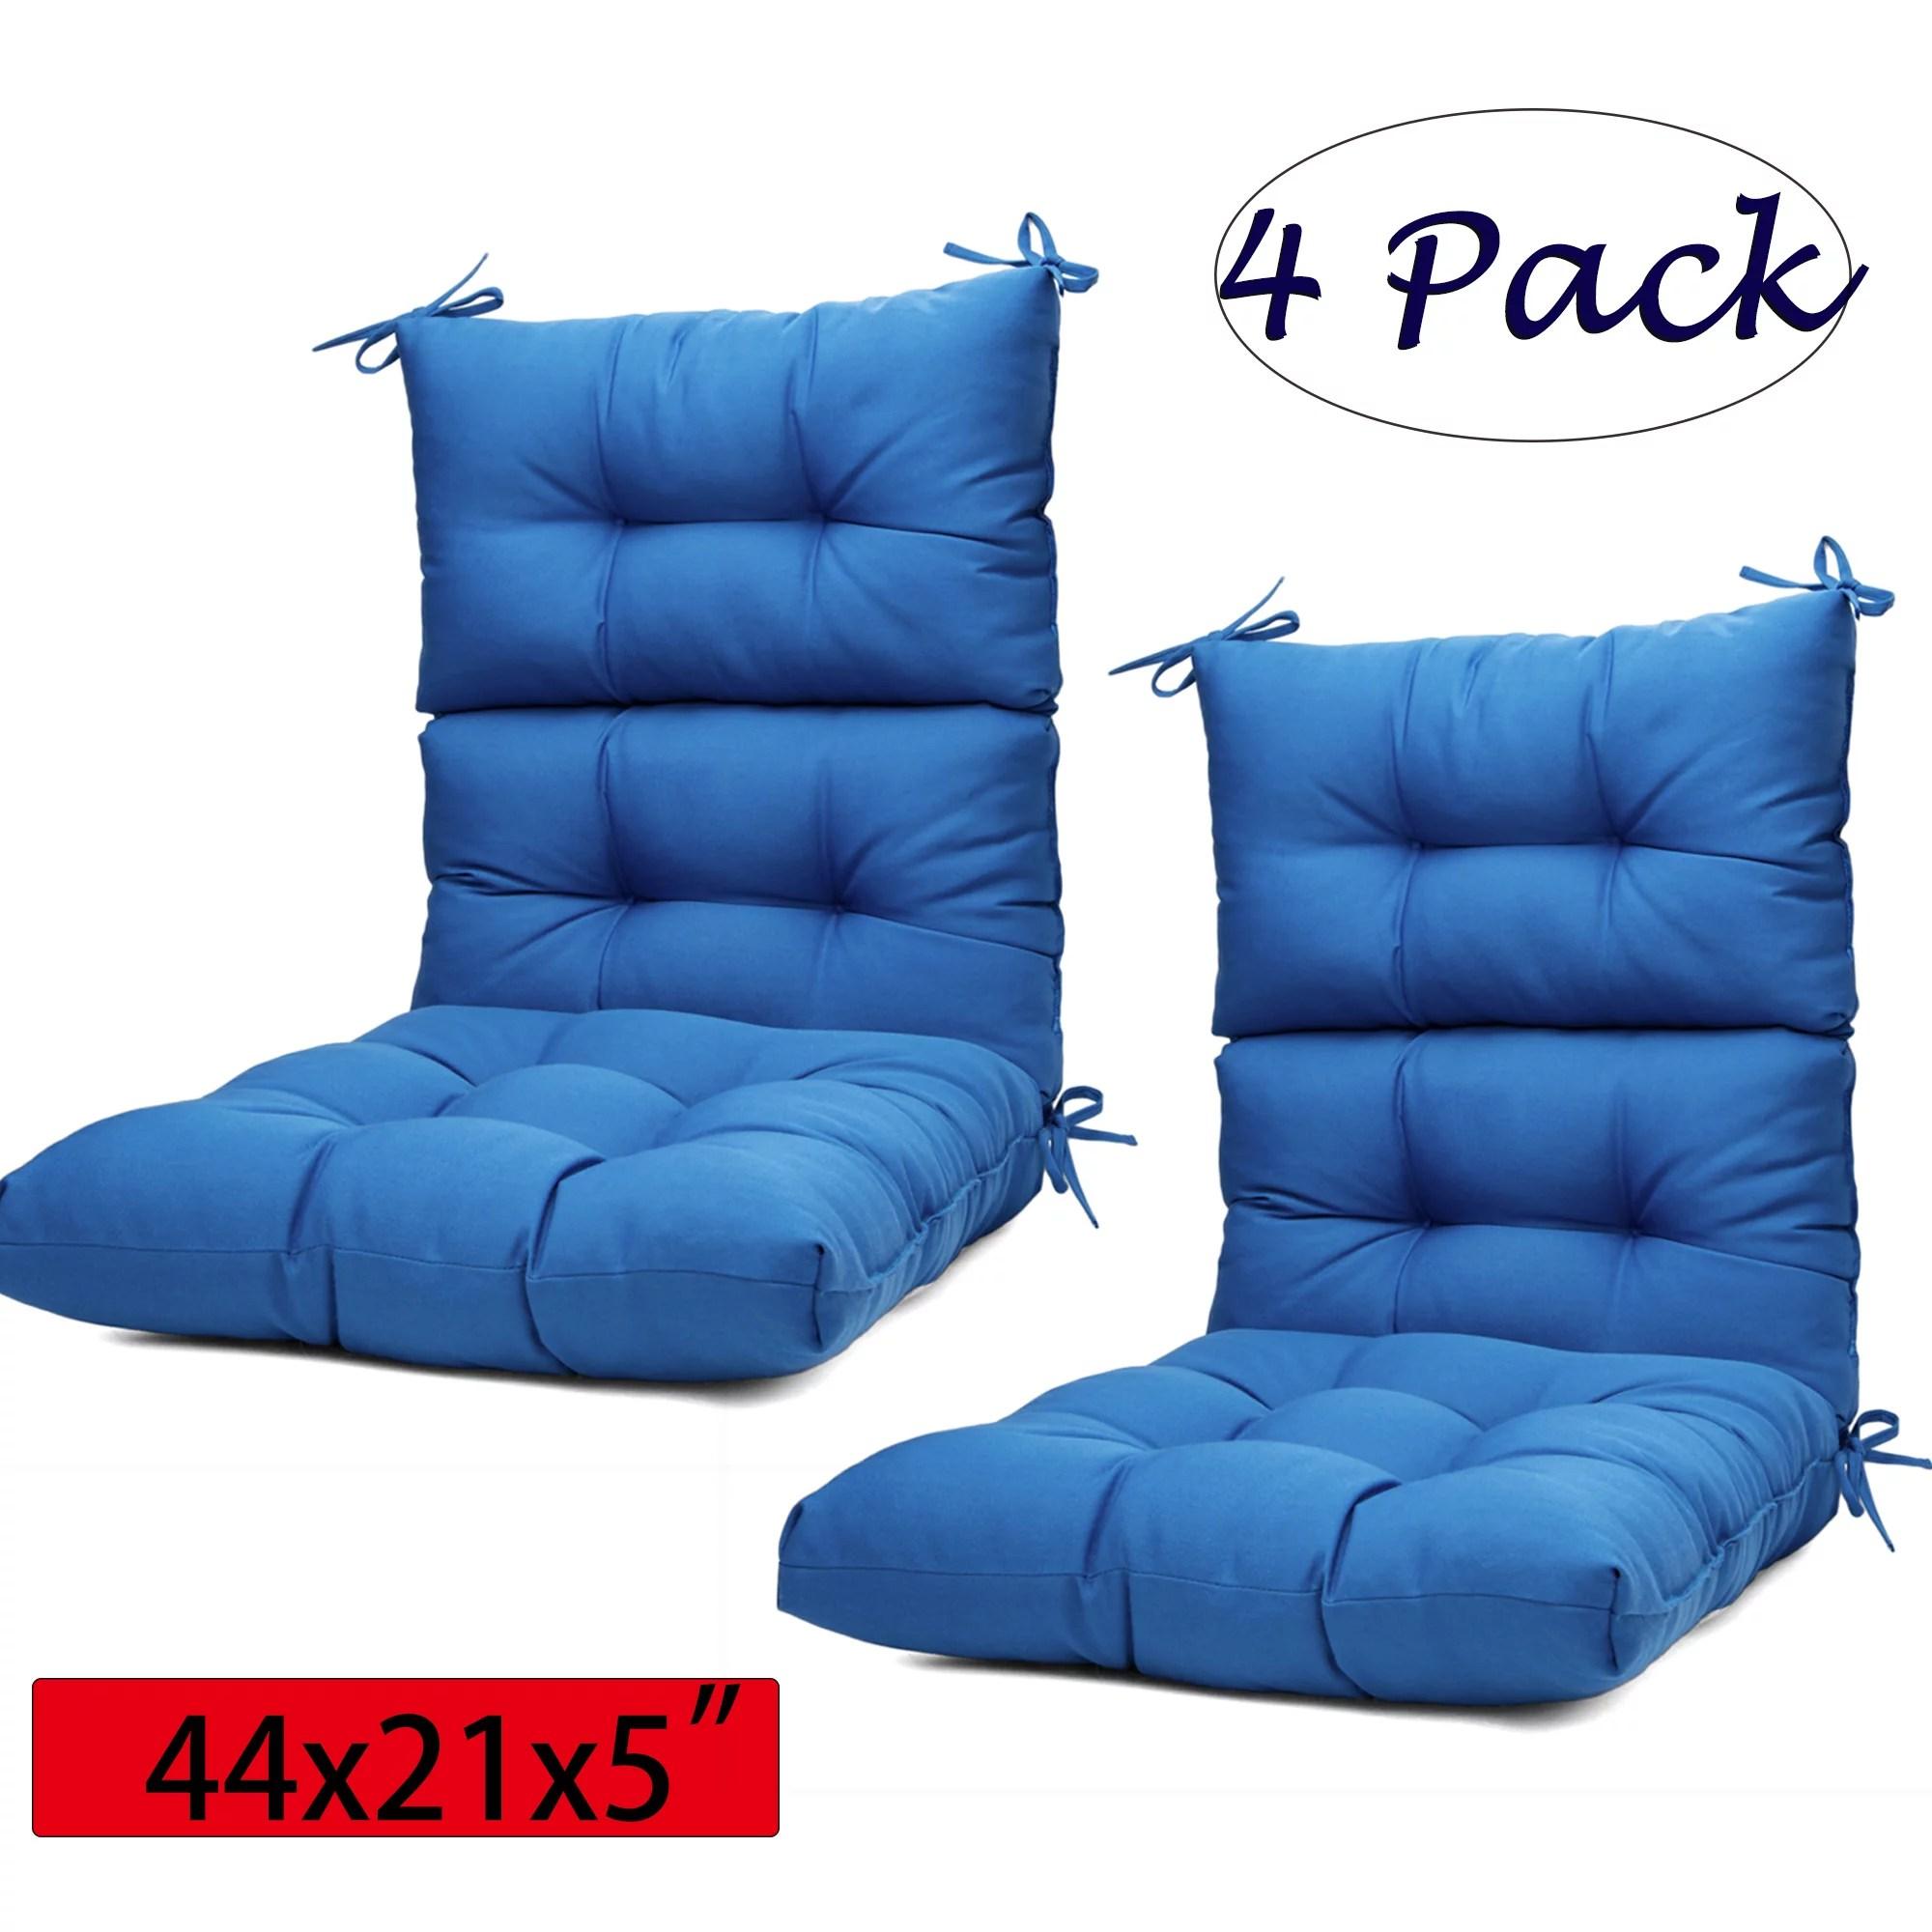 44x21x5 inch comfortable outdoor dining chair cushion high back solid chair cushion high rebound foam cushion four color 1 set 2 set 4 set